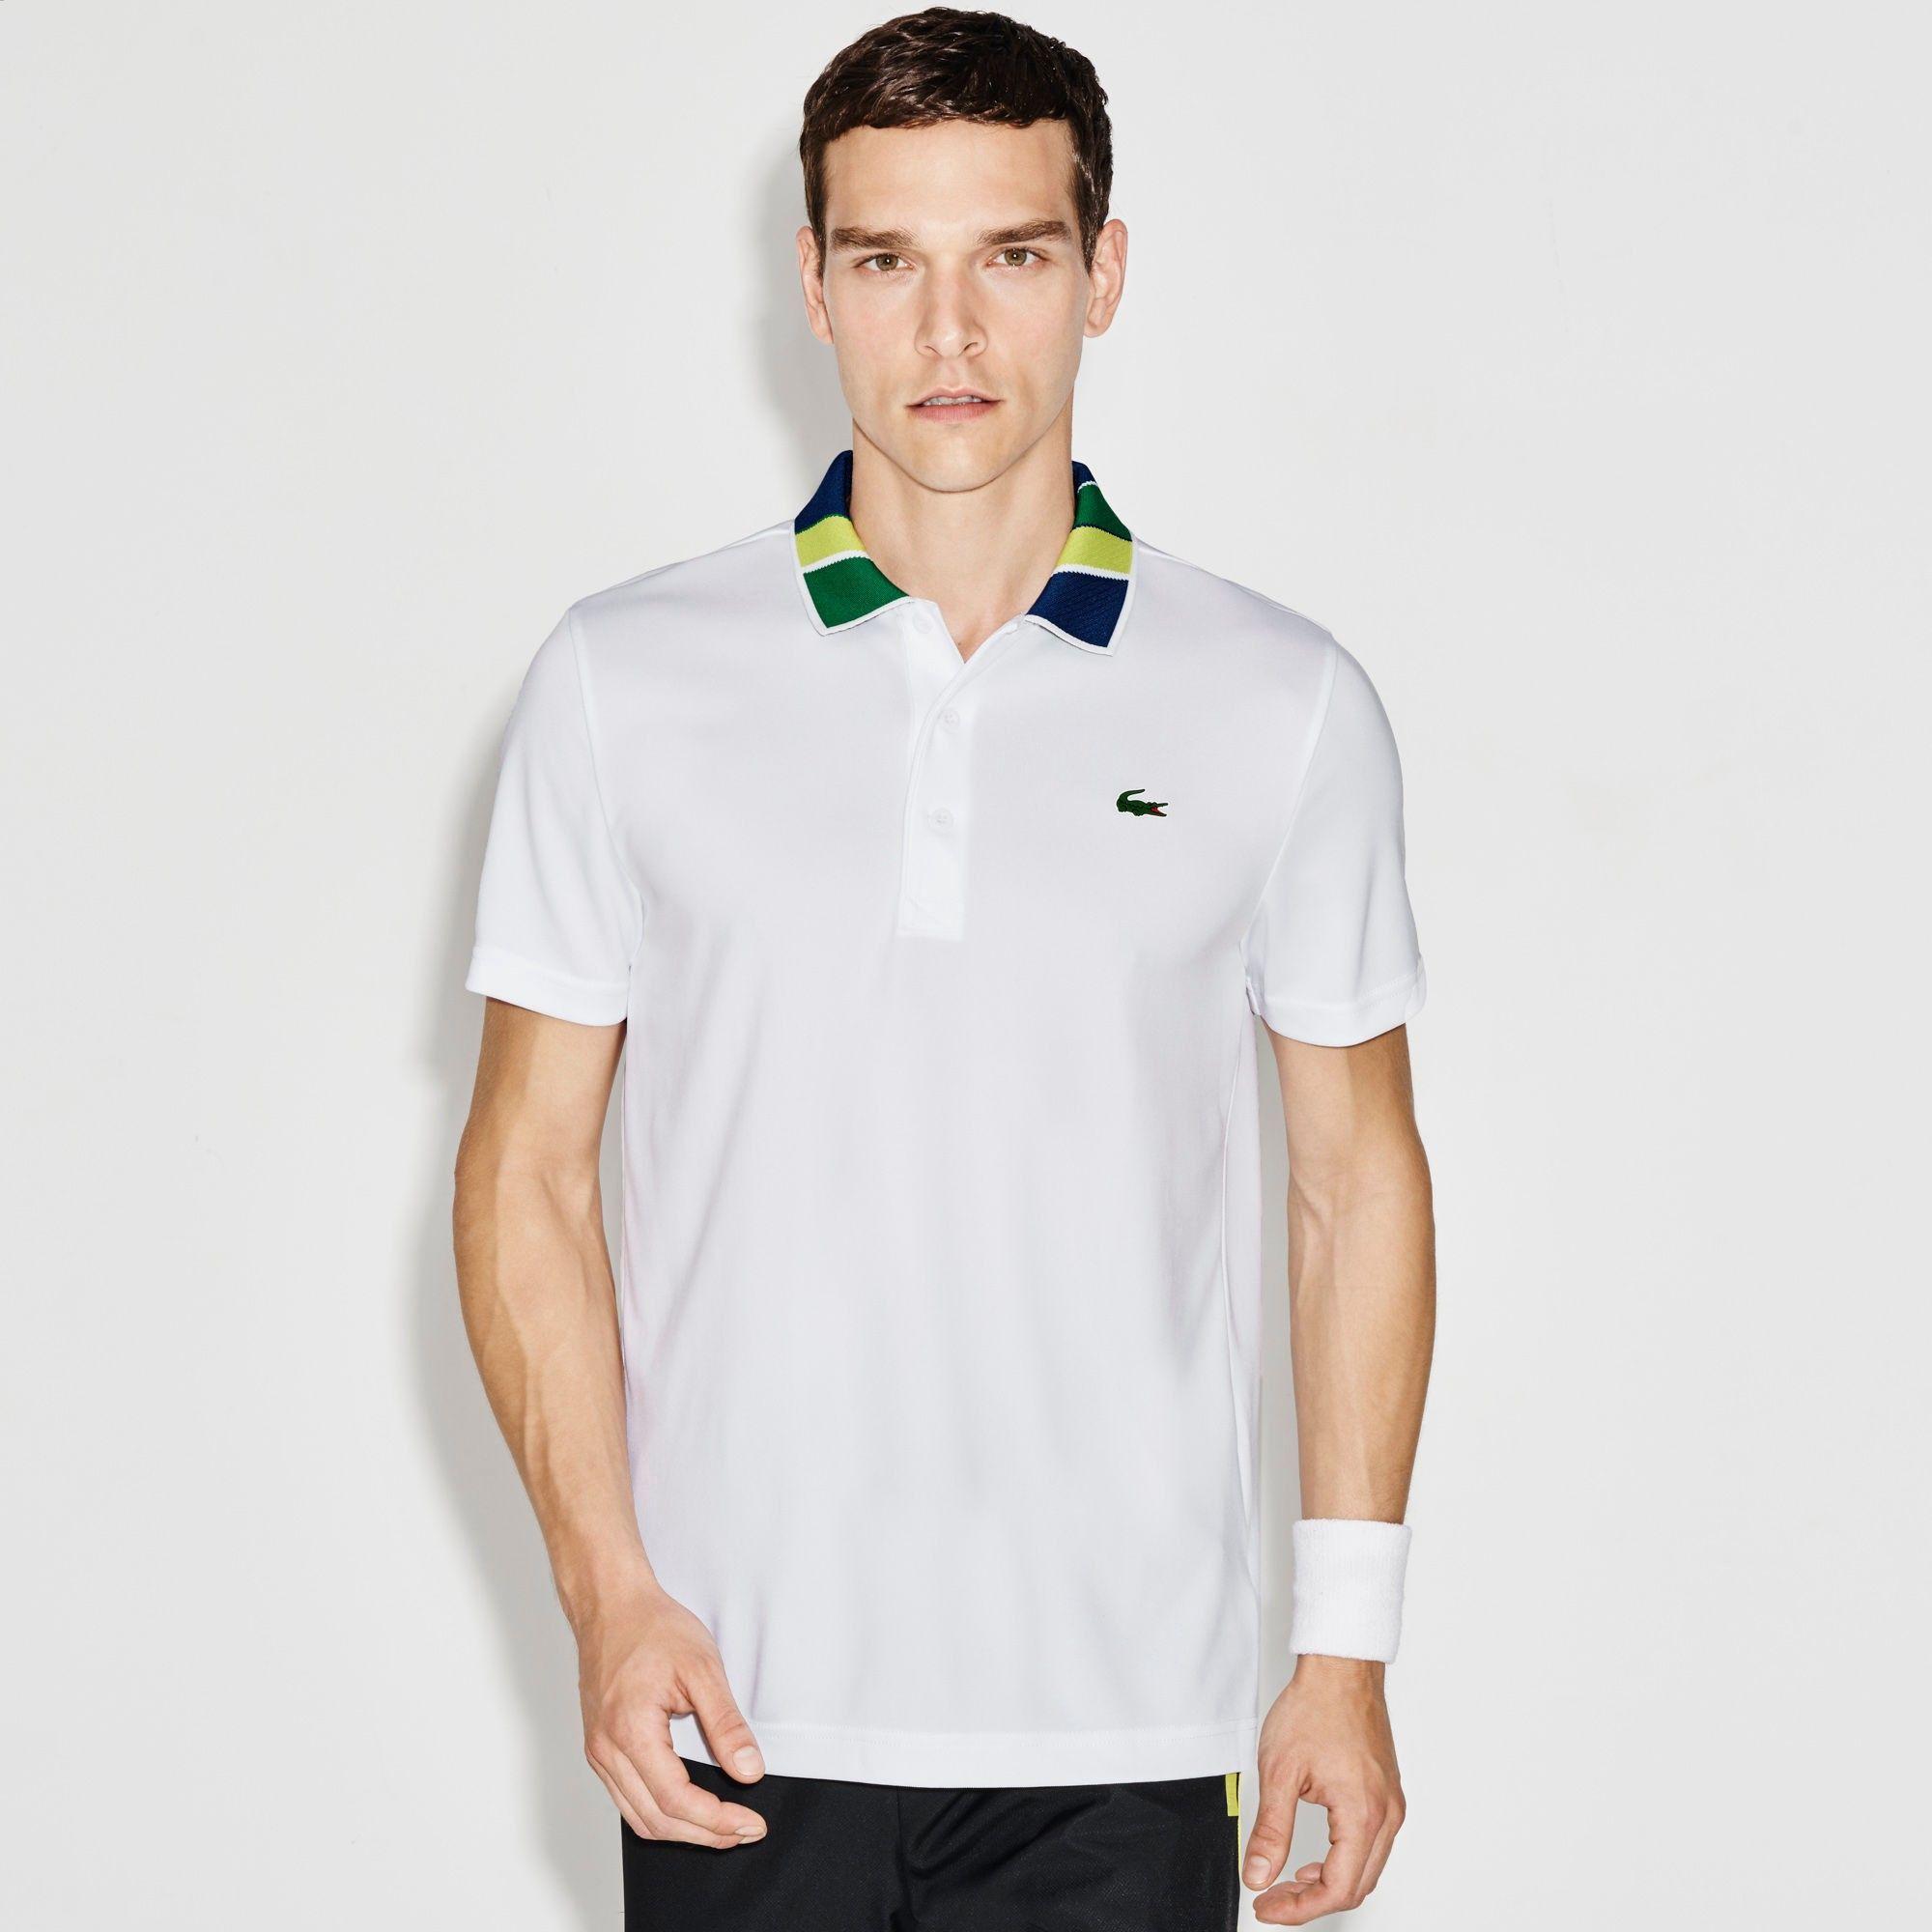 Lacoste Men S Sport Print Neck Technical Pique Tennis Polo White Lemon Tree France W Modesens 2020